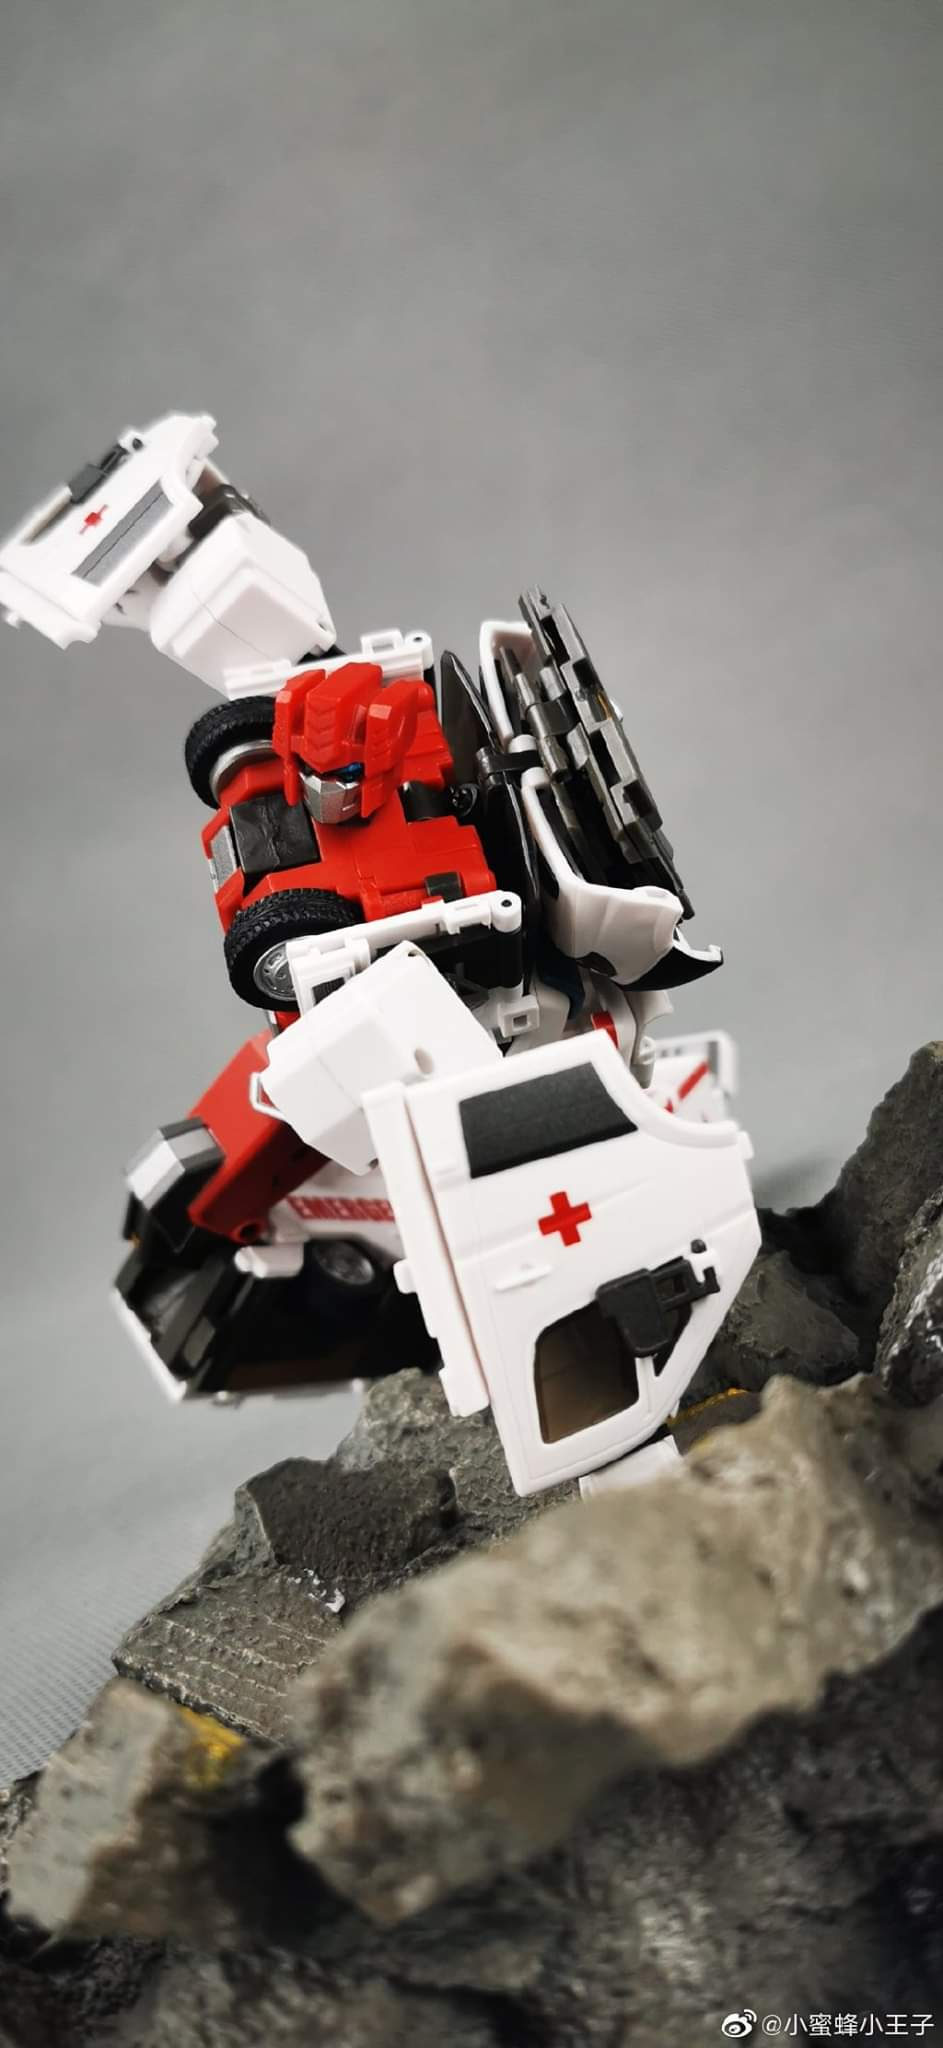 [Generation Toy] Produit Tiers - Jouet GT-08 Guardian - aka Defensor/Defenso - Page 2 MLgIWtu0_o